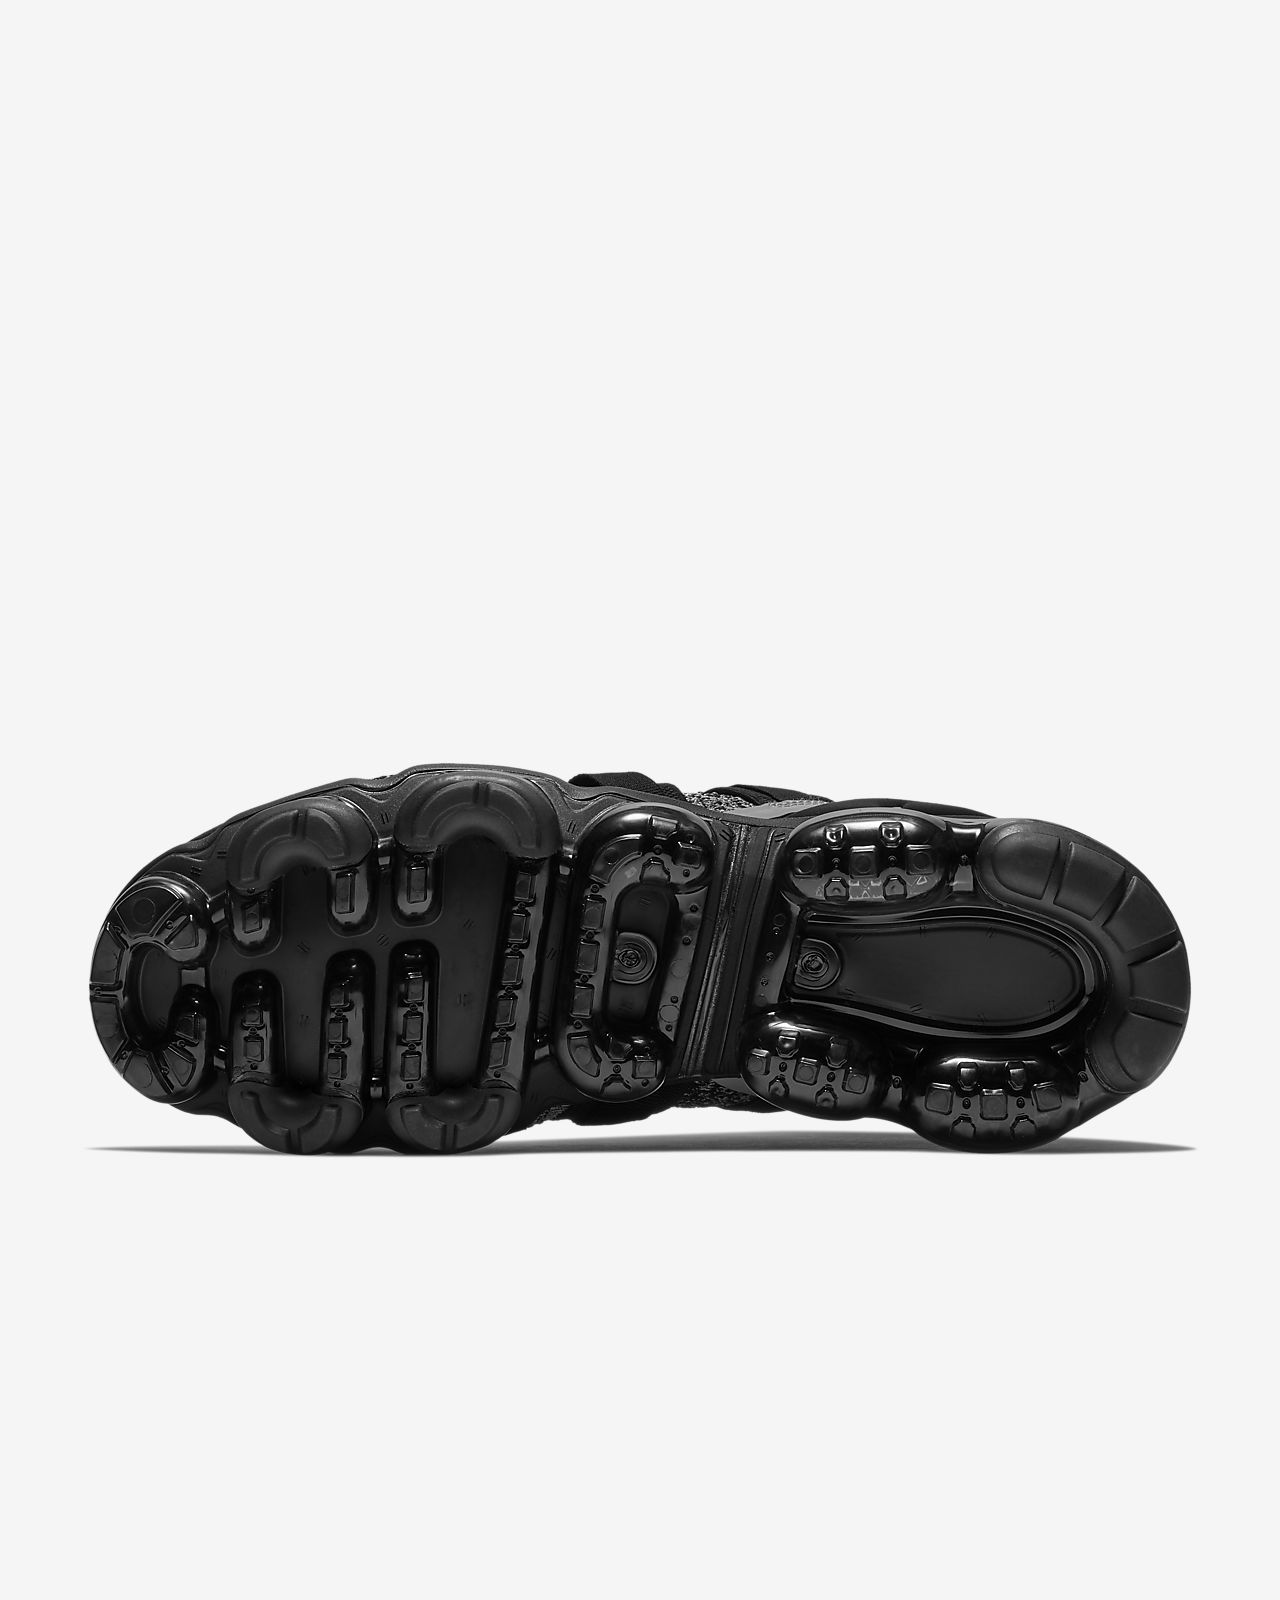 new concept 4542a 4e2df ... Nike Air VaporMax Flyknit Utility Shoe